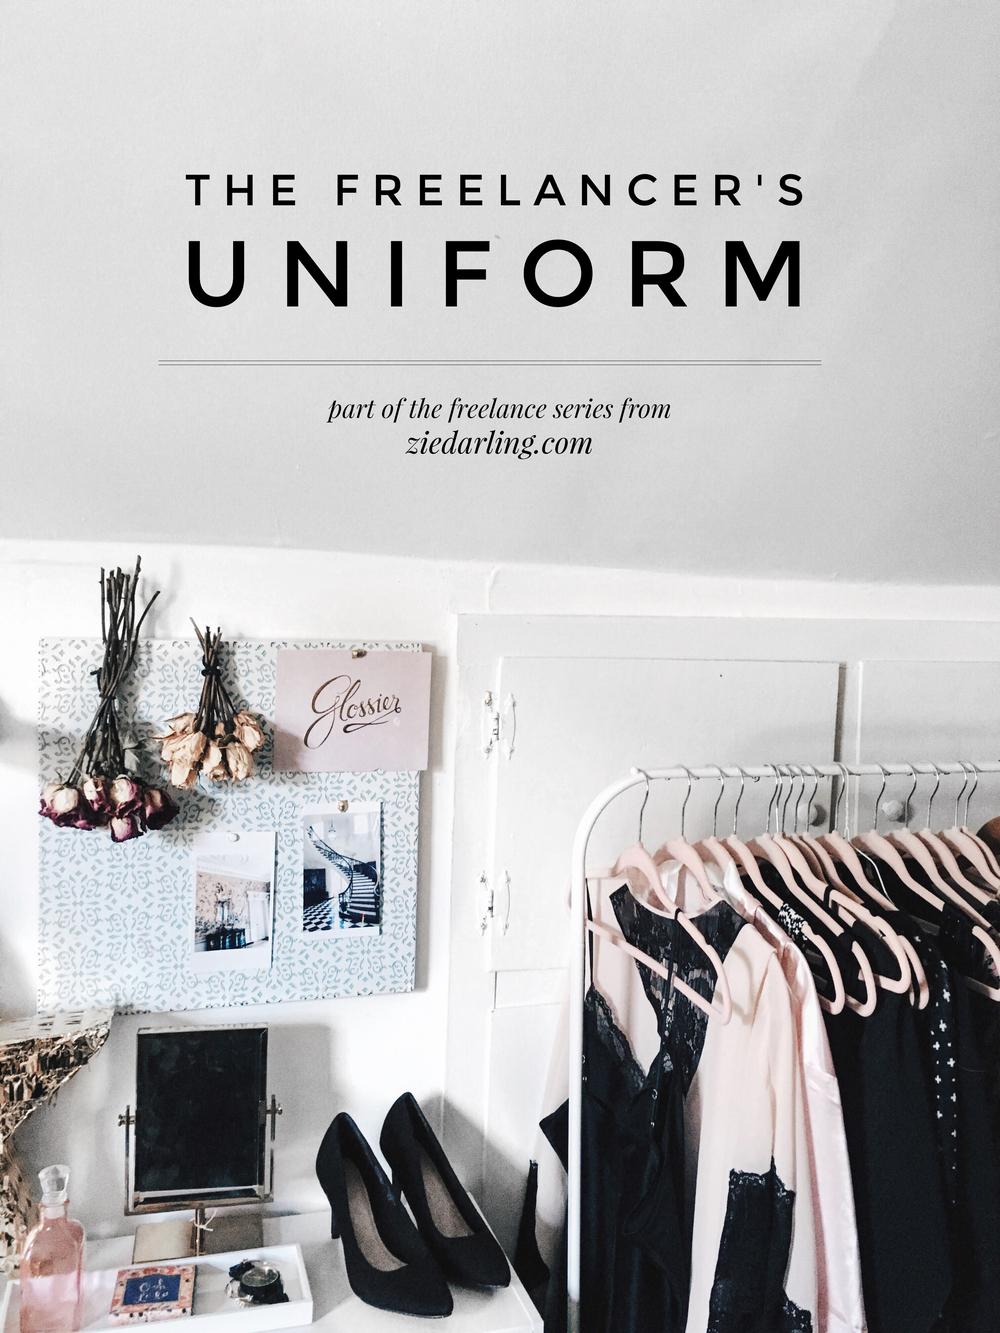 ziedarling.com | freelancer's uniform & personal style, featuring JORD Watches  #jordwatch #wearJORD #BeYou